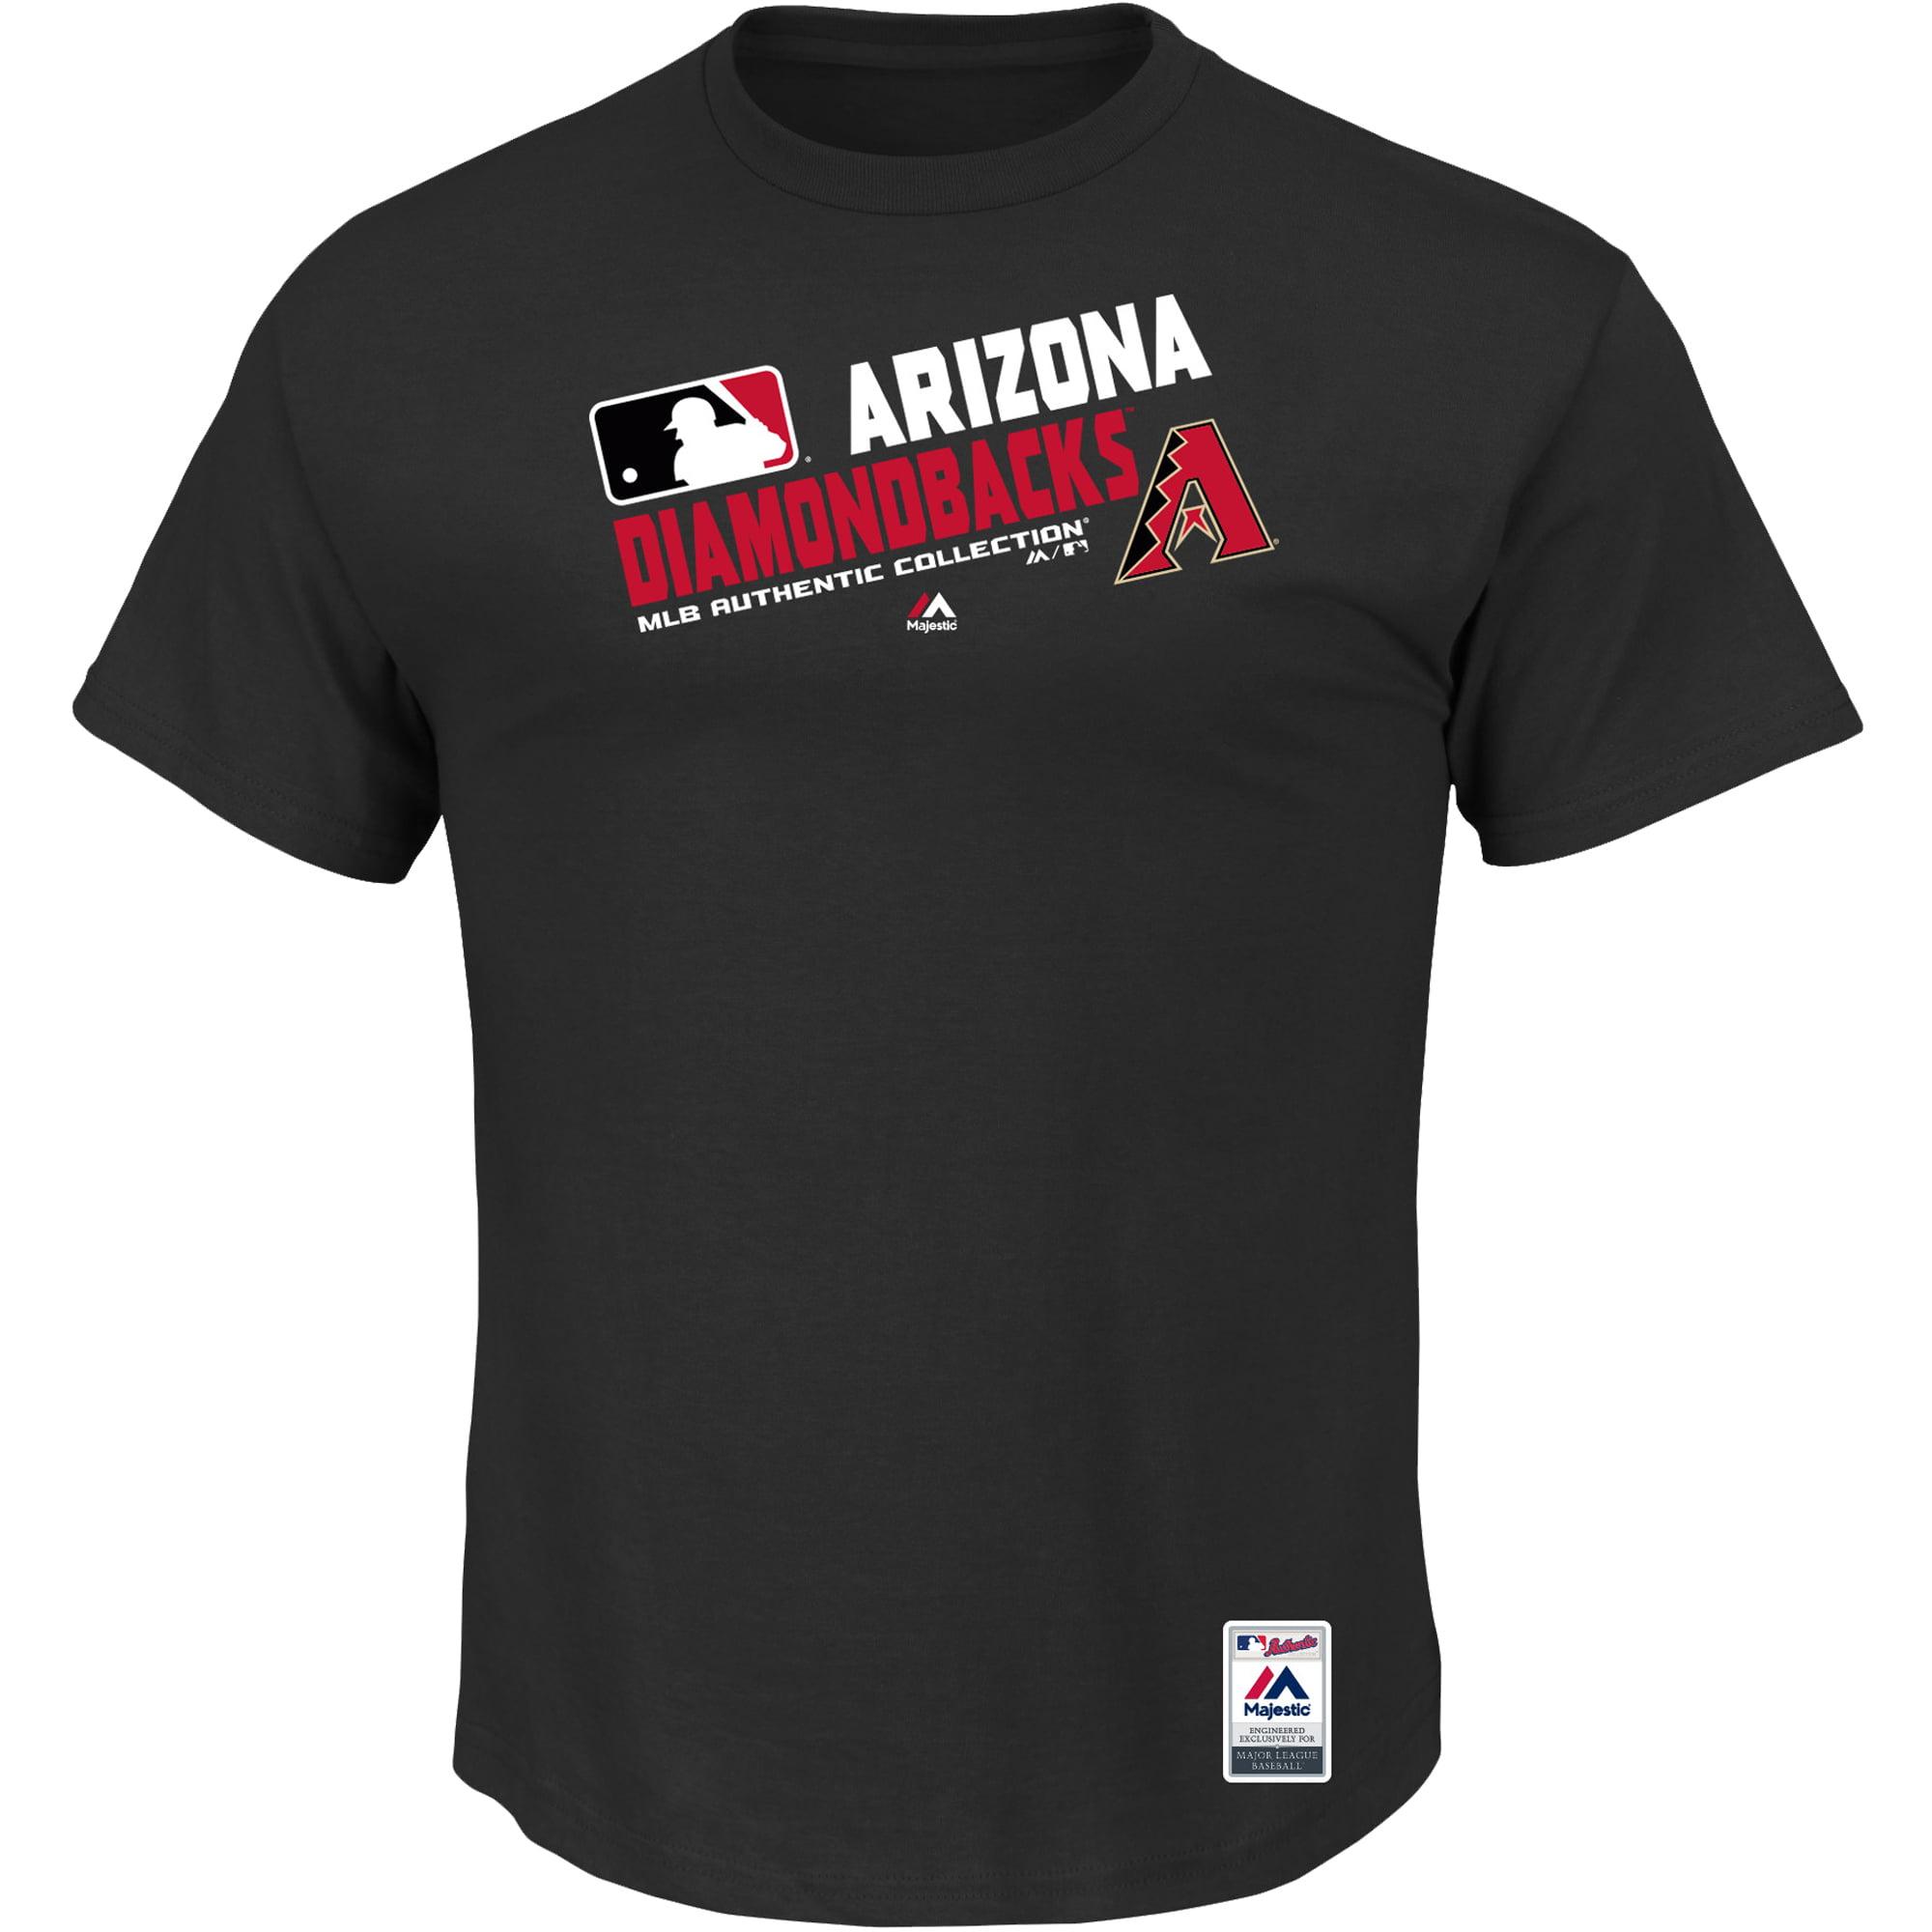 Arizona Diamondbacks Majestic Big & Tall Authentic Collection Official Team Choice T-Shirt - Black